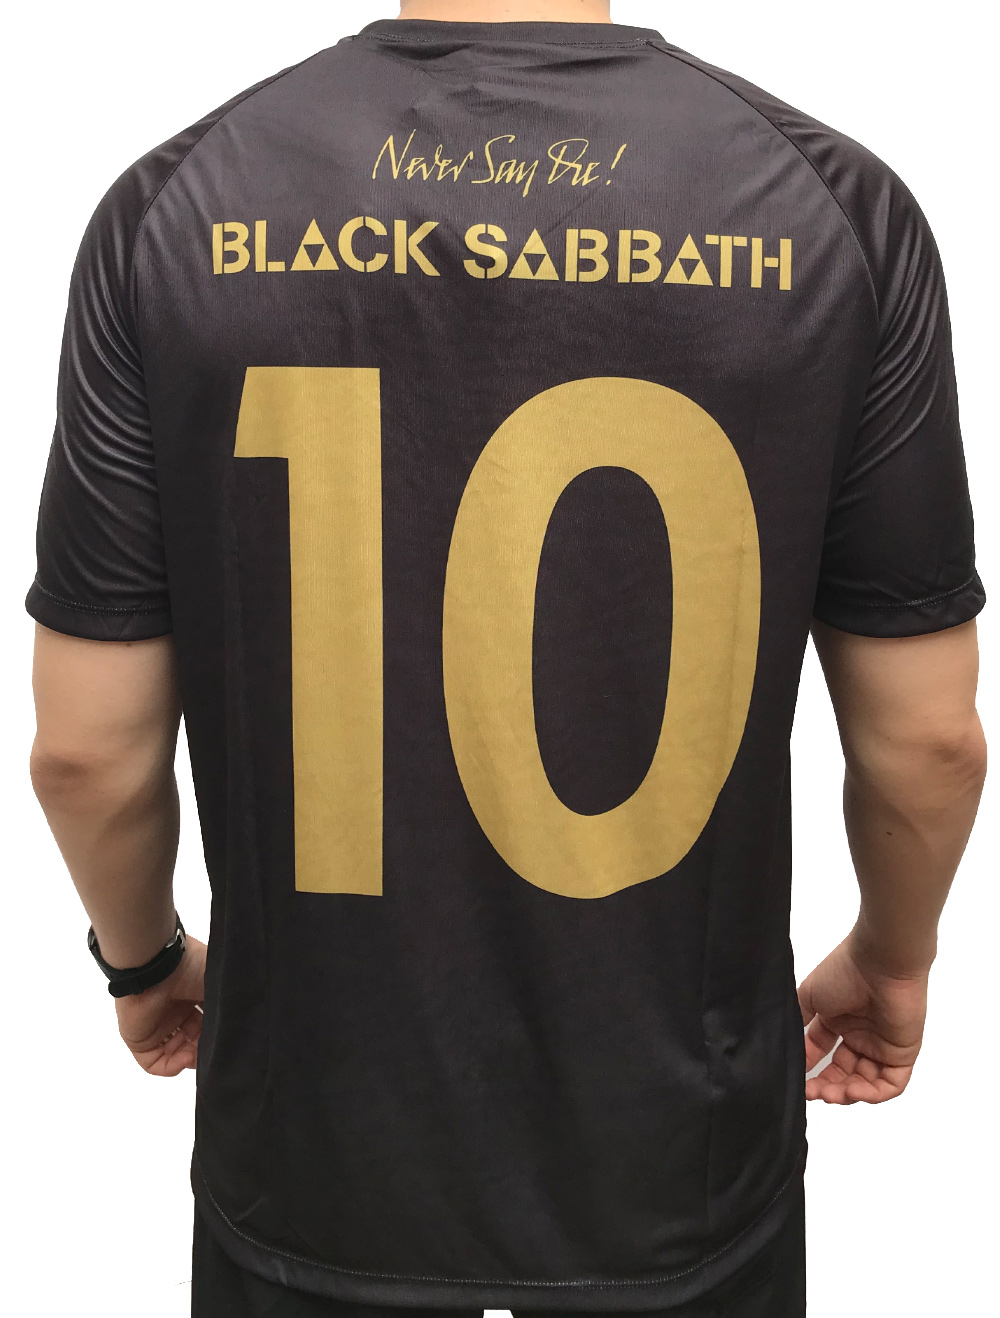 CAMISA DE FUTEBOL BLACK SABBATH - NEVER SAY DIE